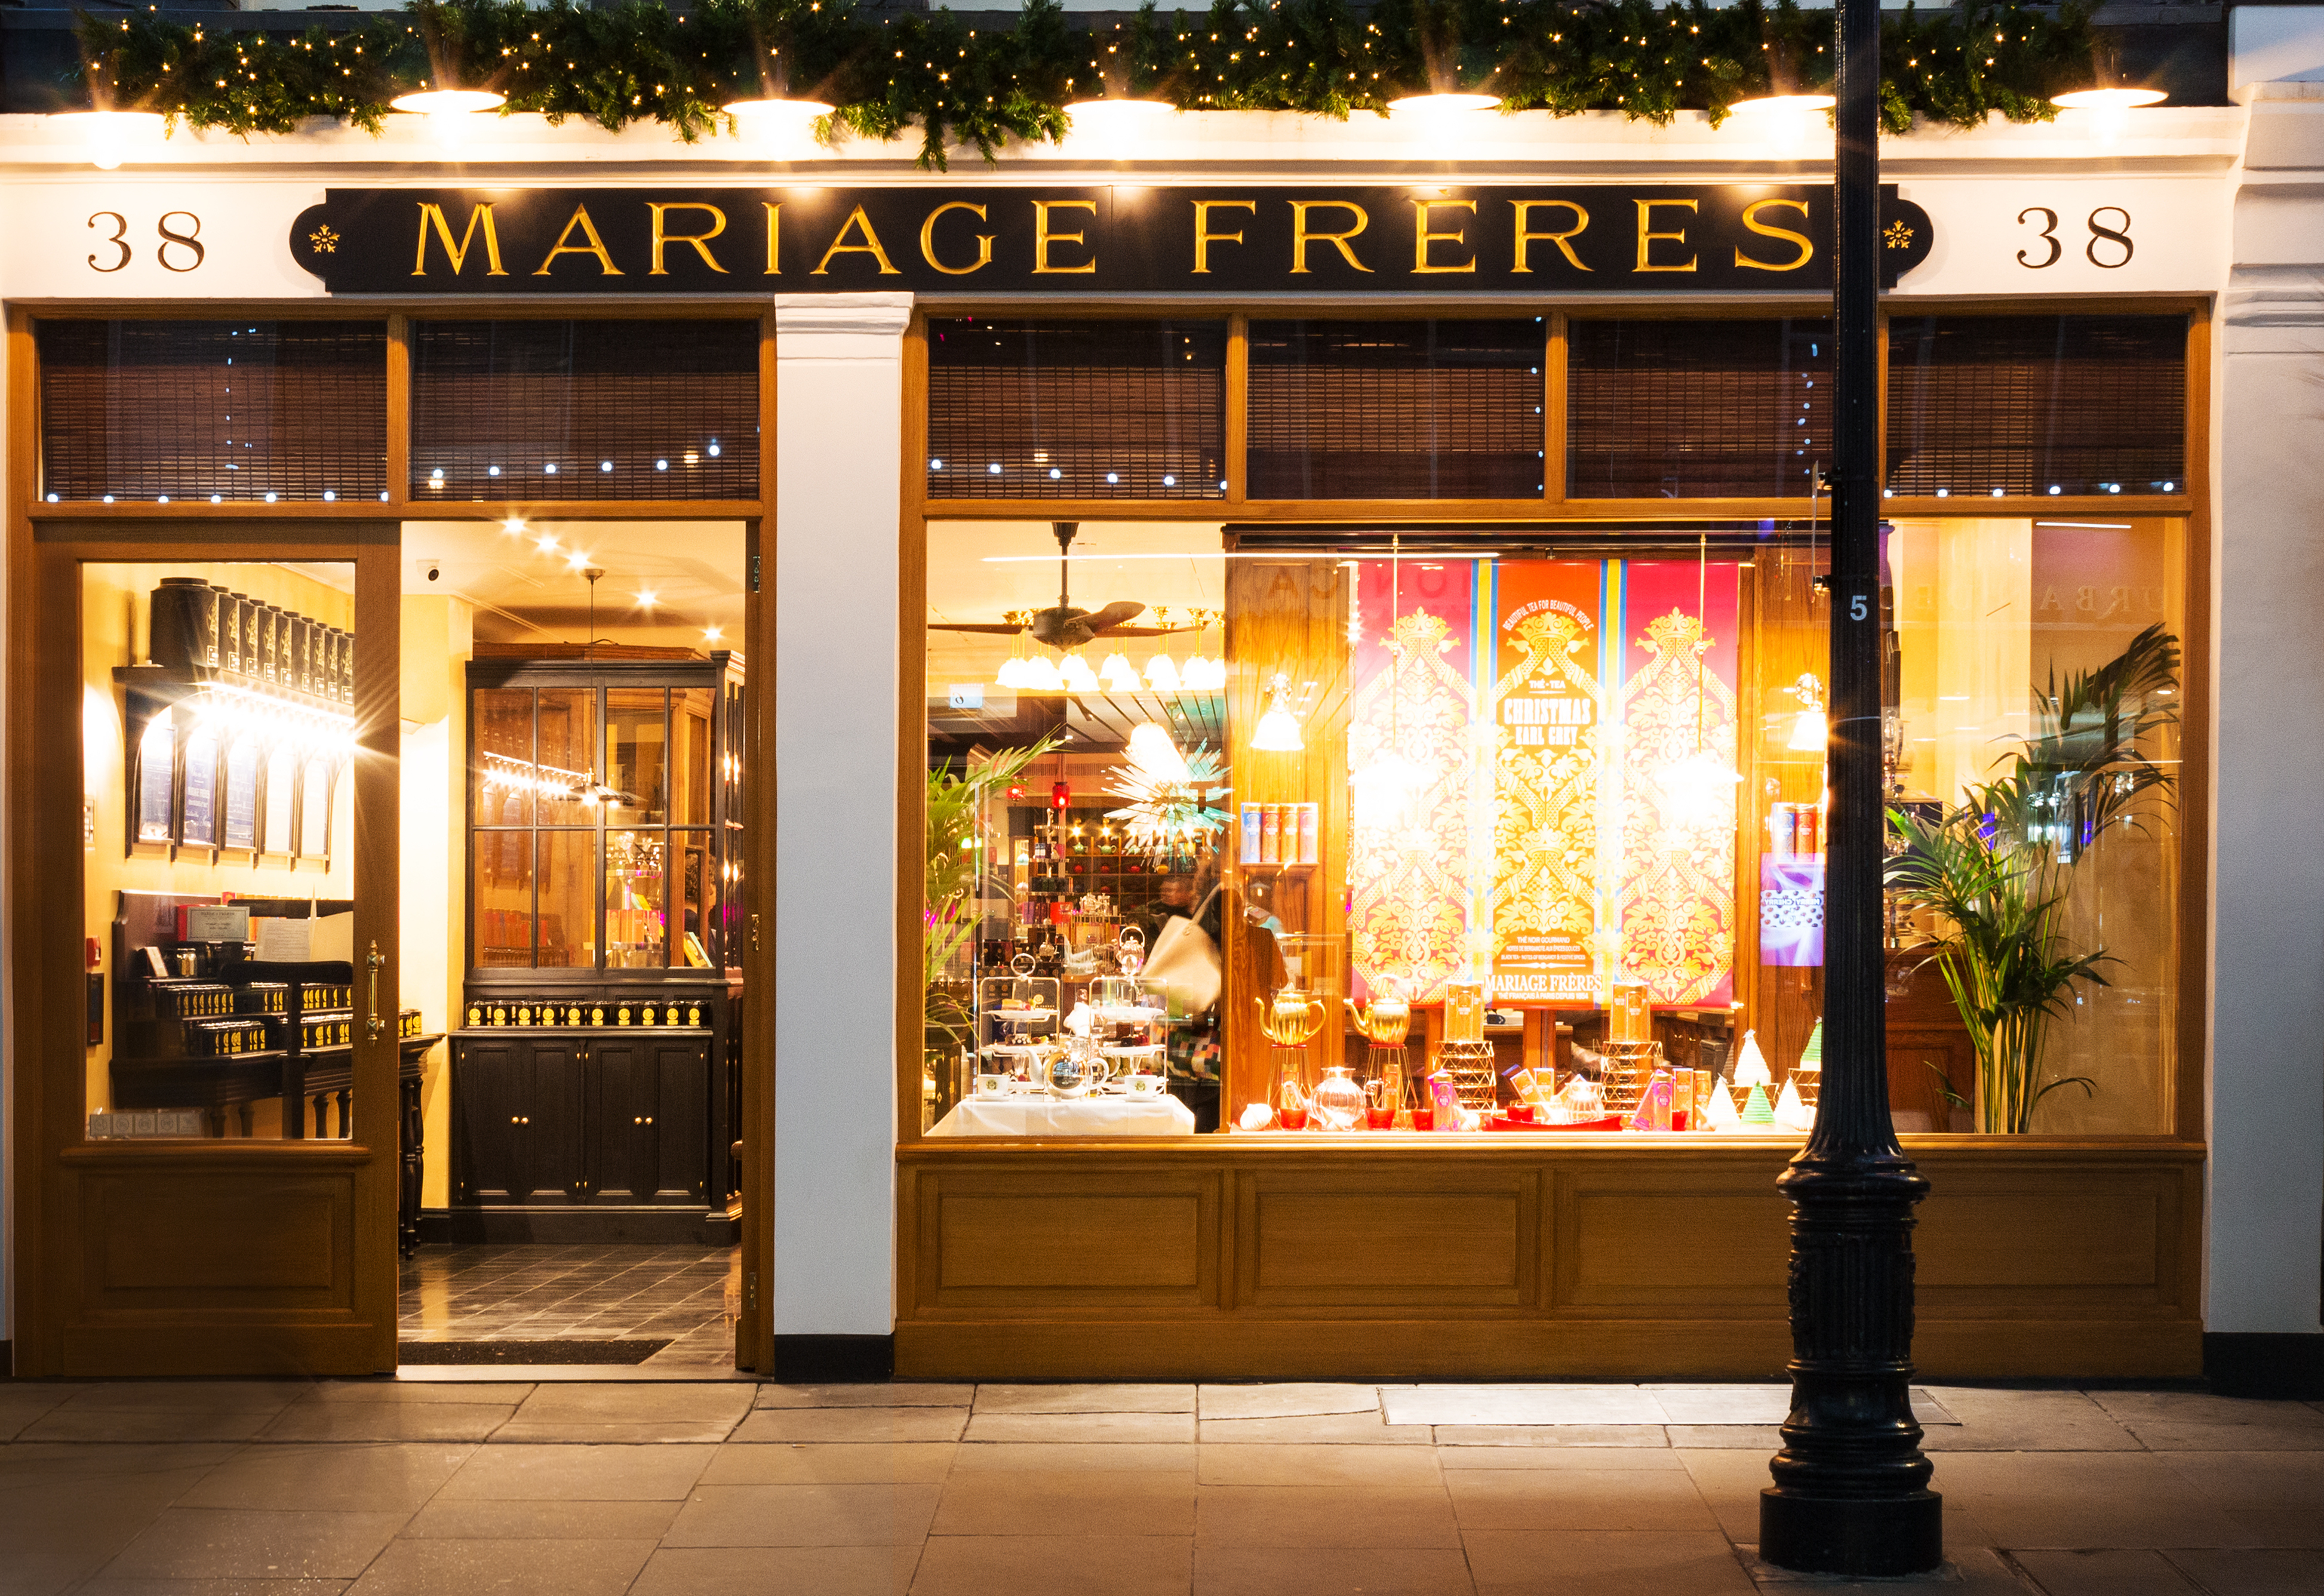 Mariage Freres opens its Parisian tea emporium in Covent Garden, London